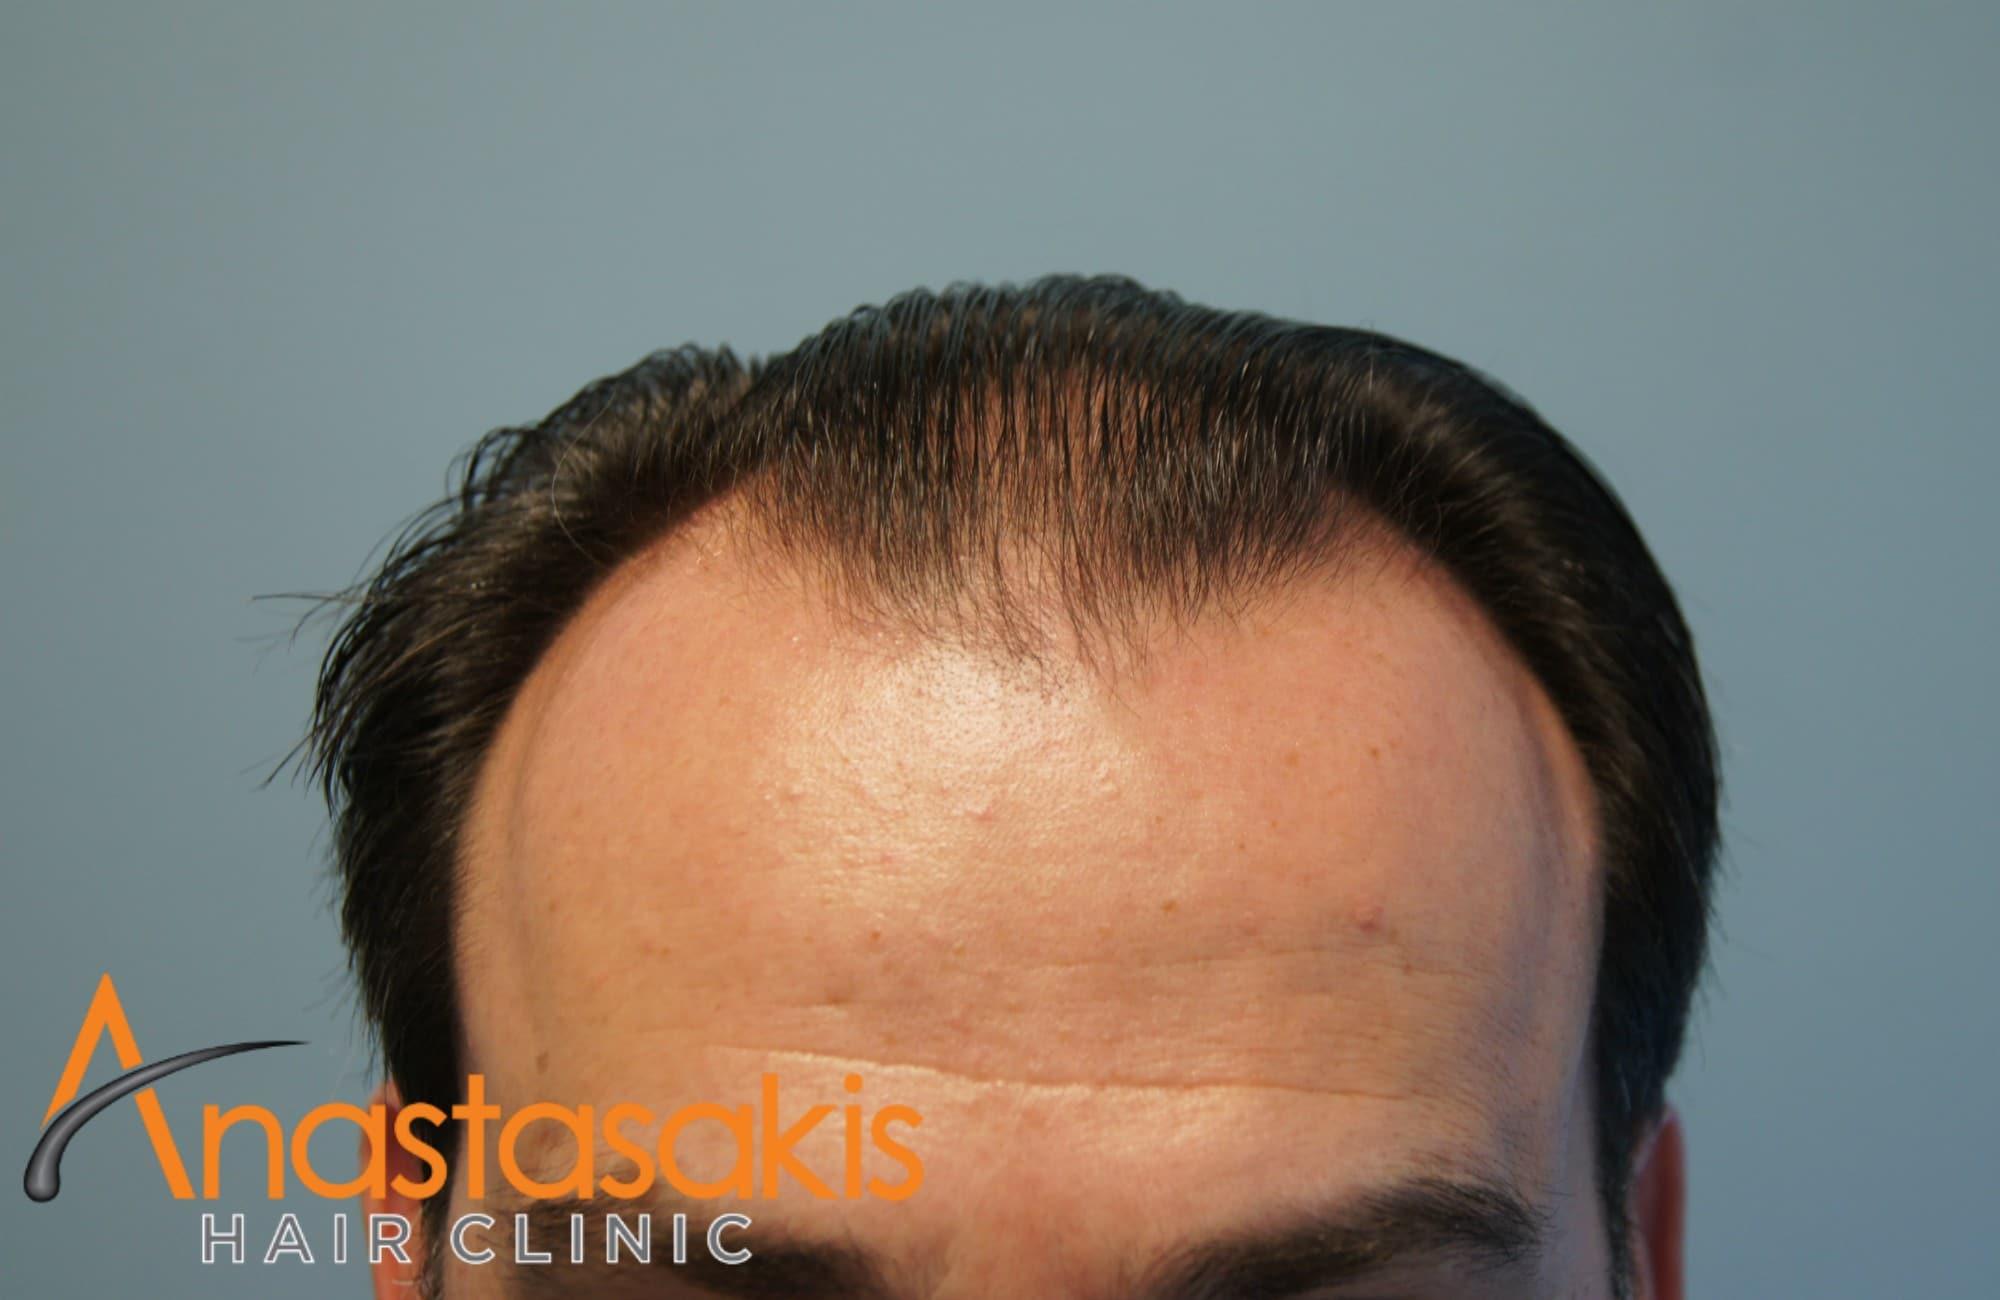 hairline ασθενούς πριν τη μεταμοσχευση μαλλιων με 3500 fus με τη μεθοδο fut